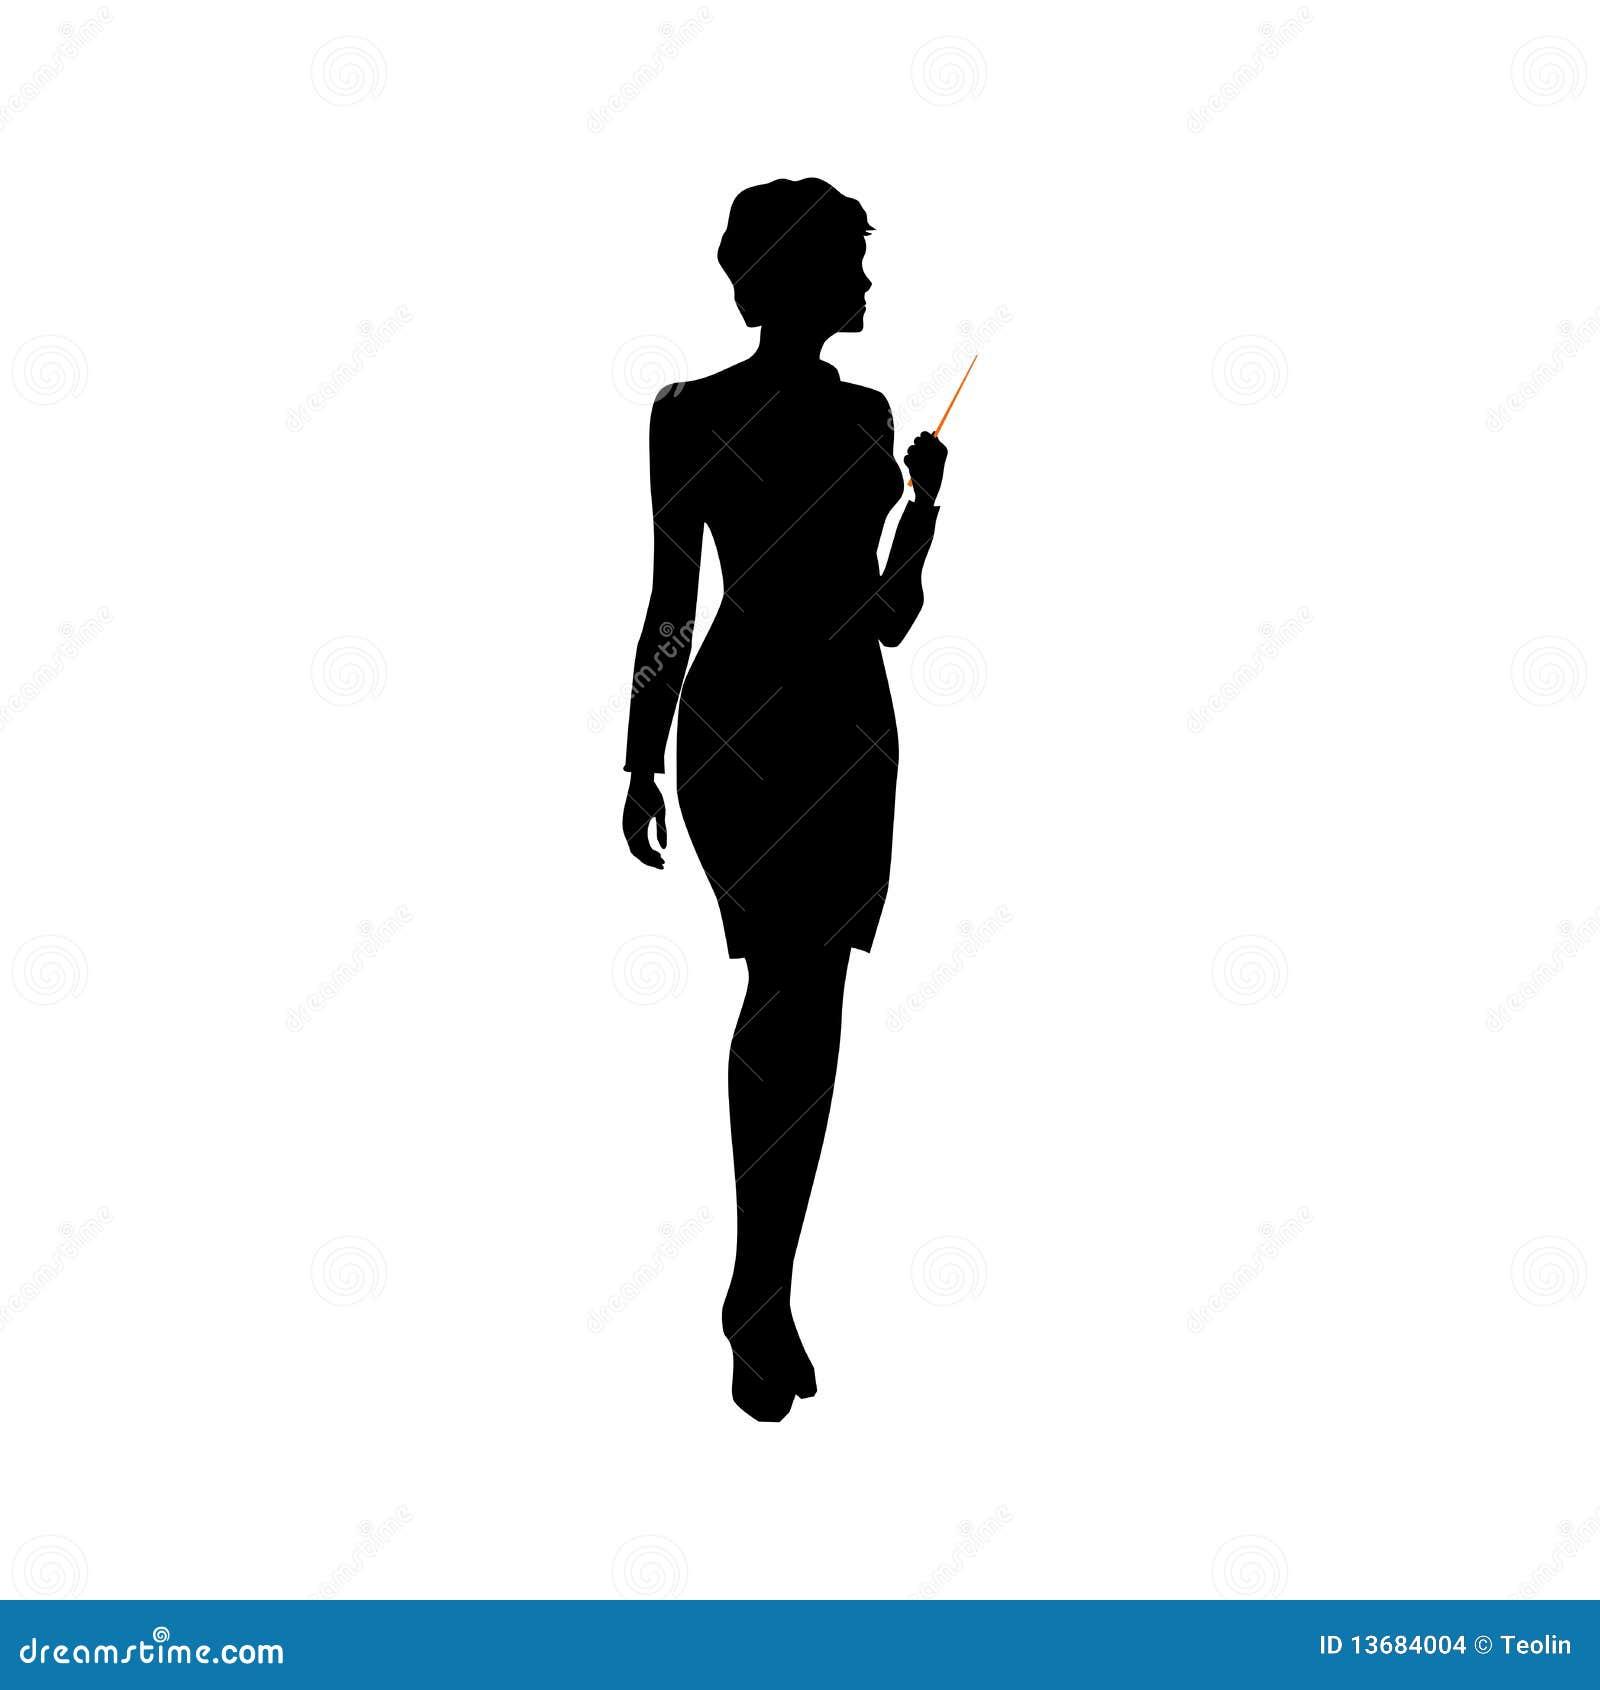 business-woman-silhouette-13684004.jpg